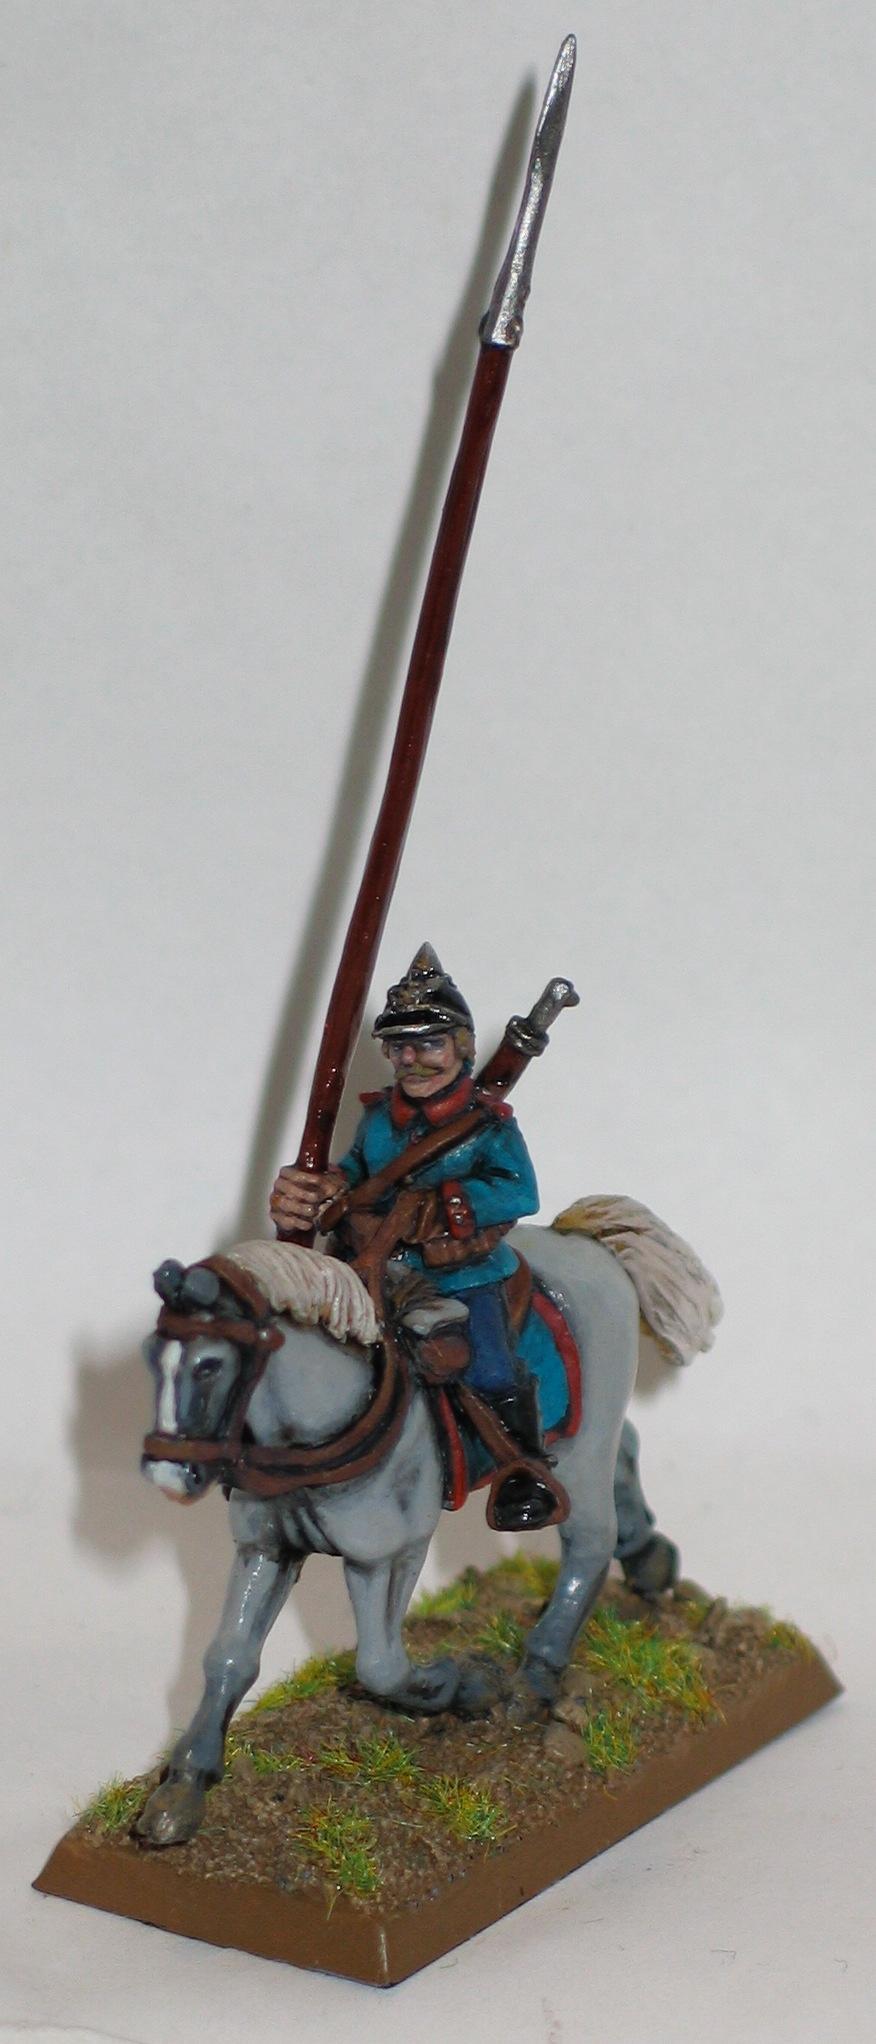 Dragoner, Dragoon, Germans, Great War, Historical, Imperial German Army, World War 1